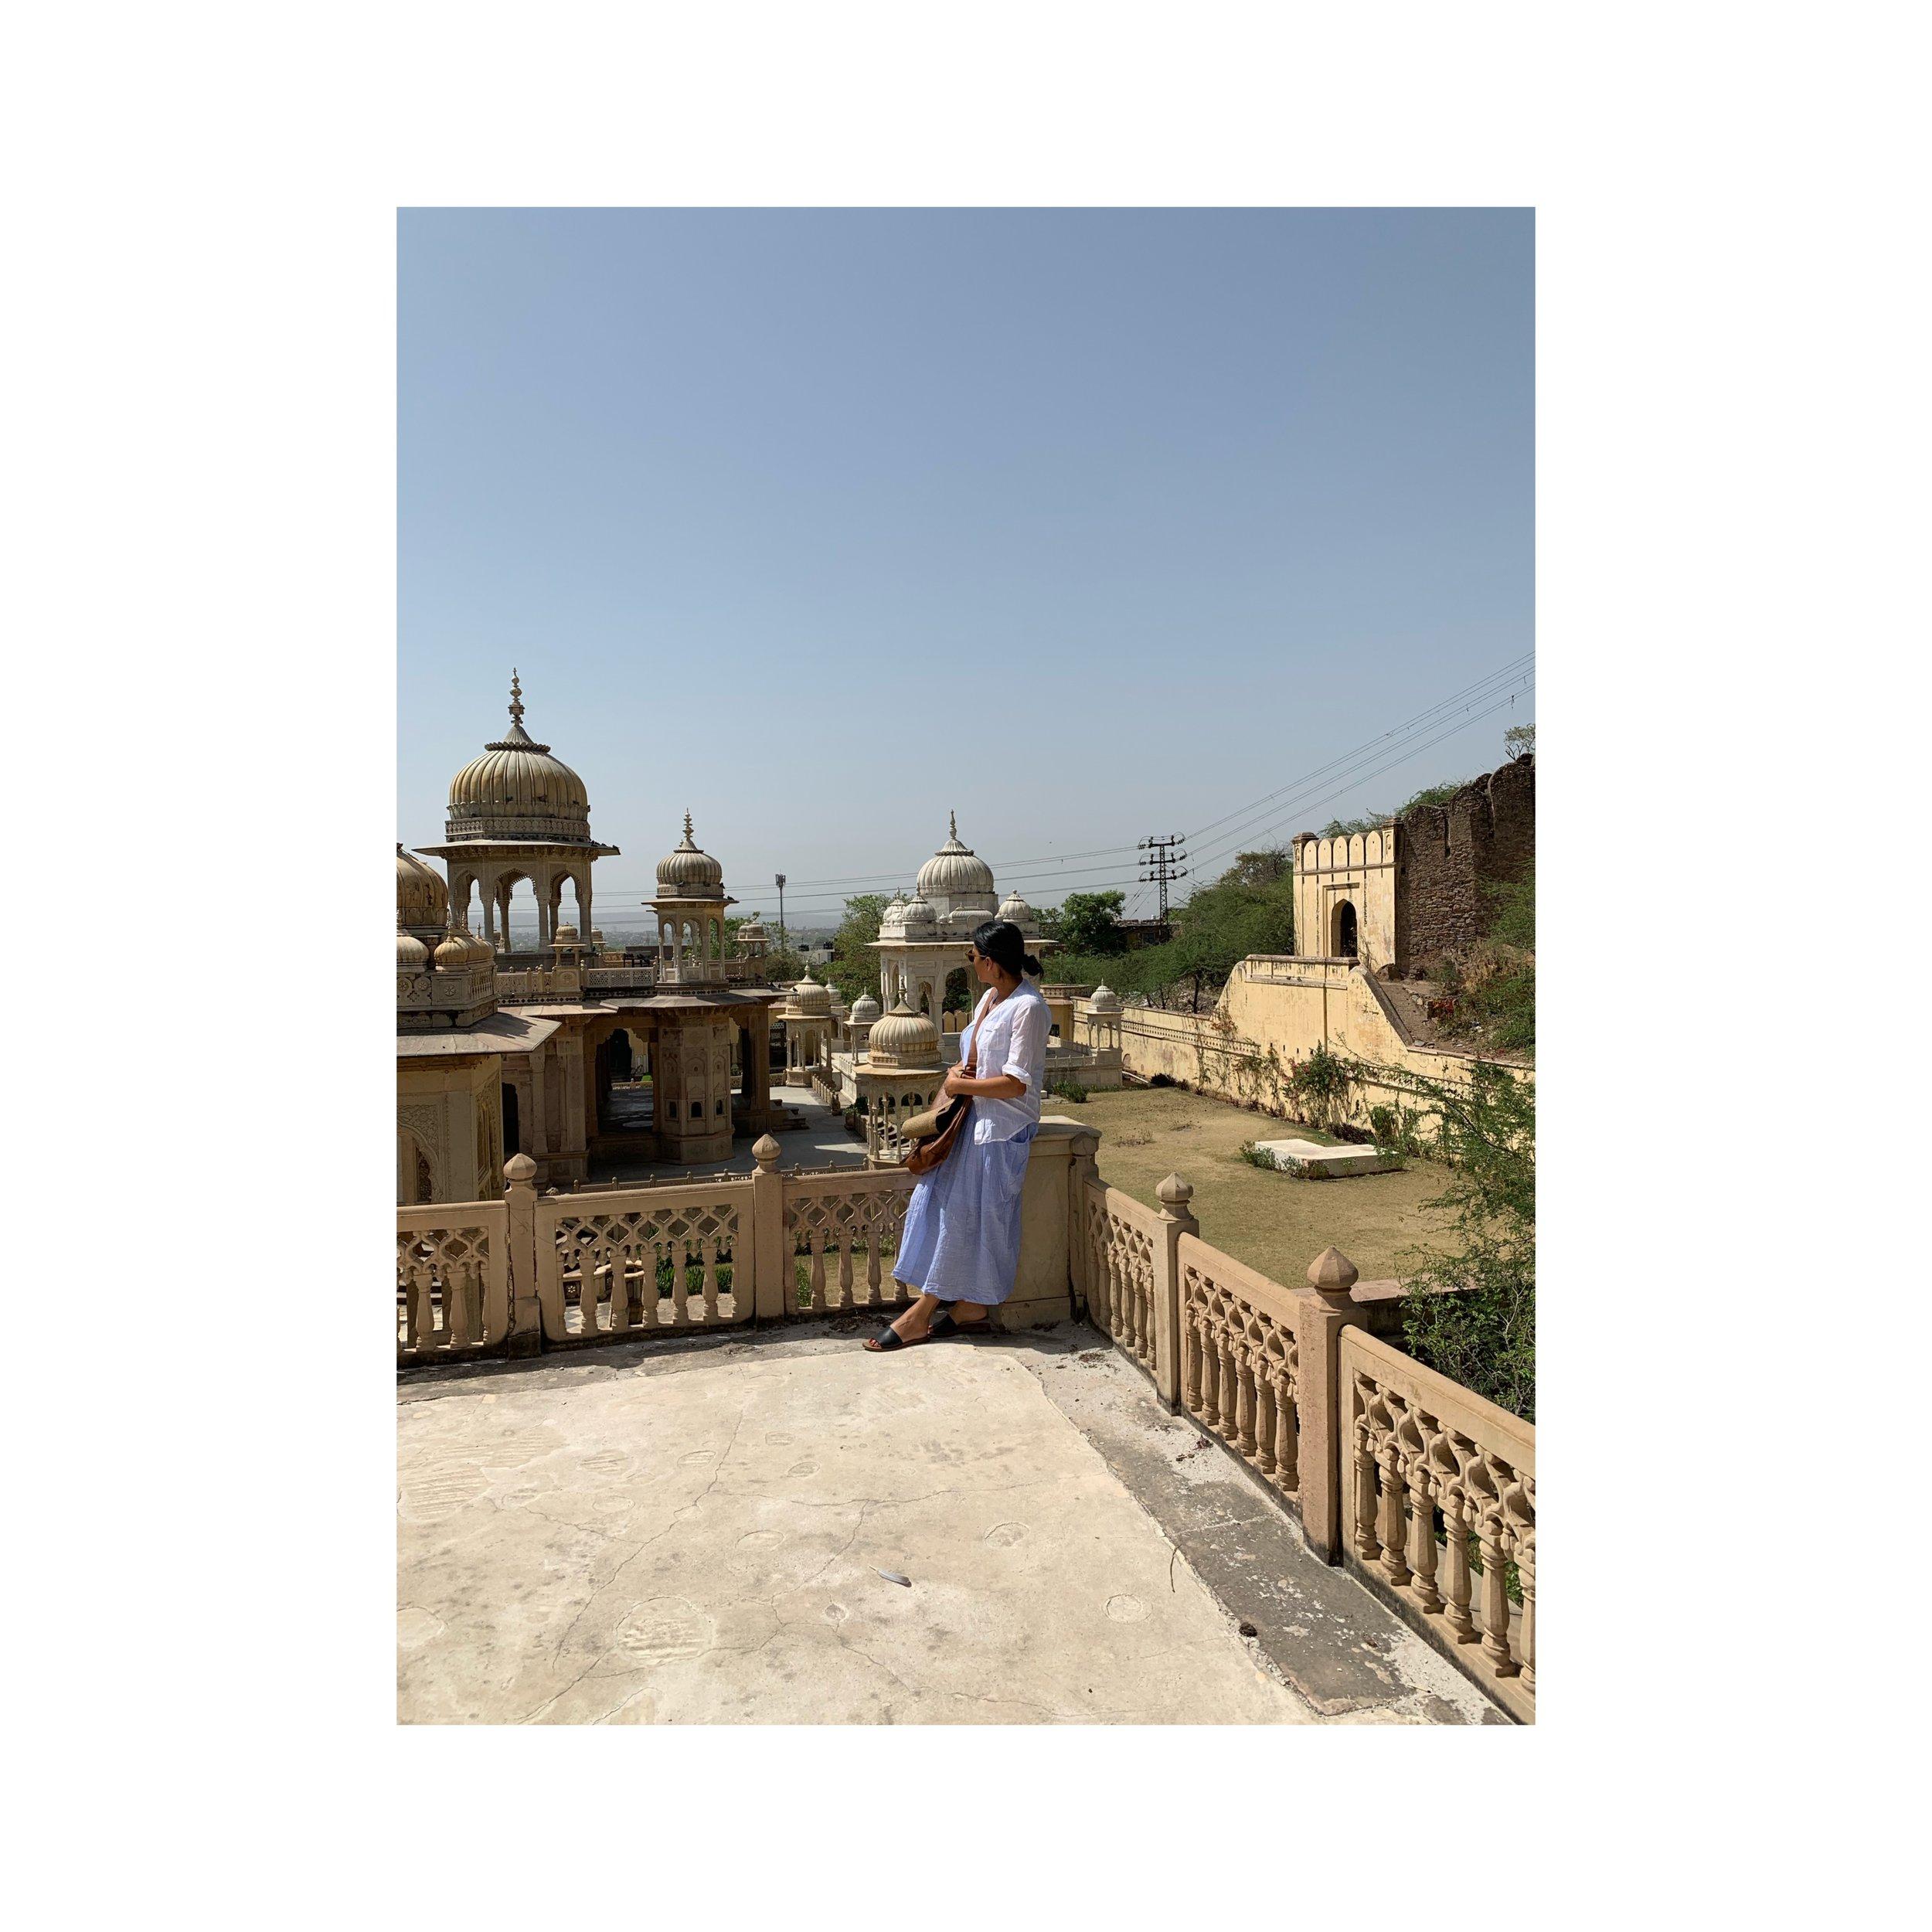 Jaipur India Ancient City Textile Sourcing - Sahana Byron Bay.JPG